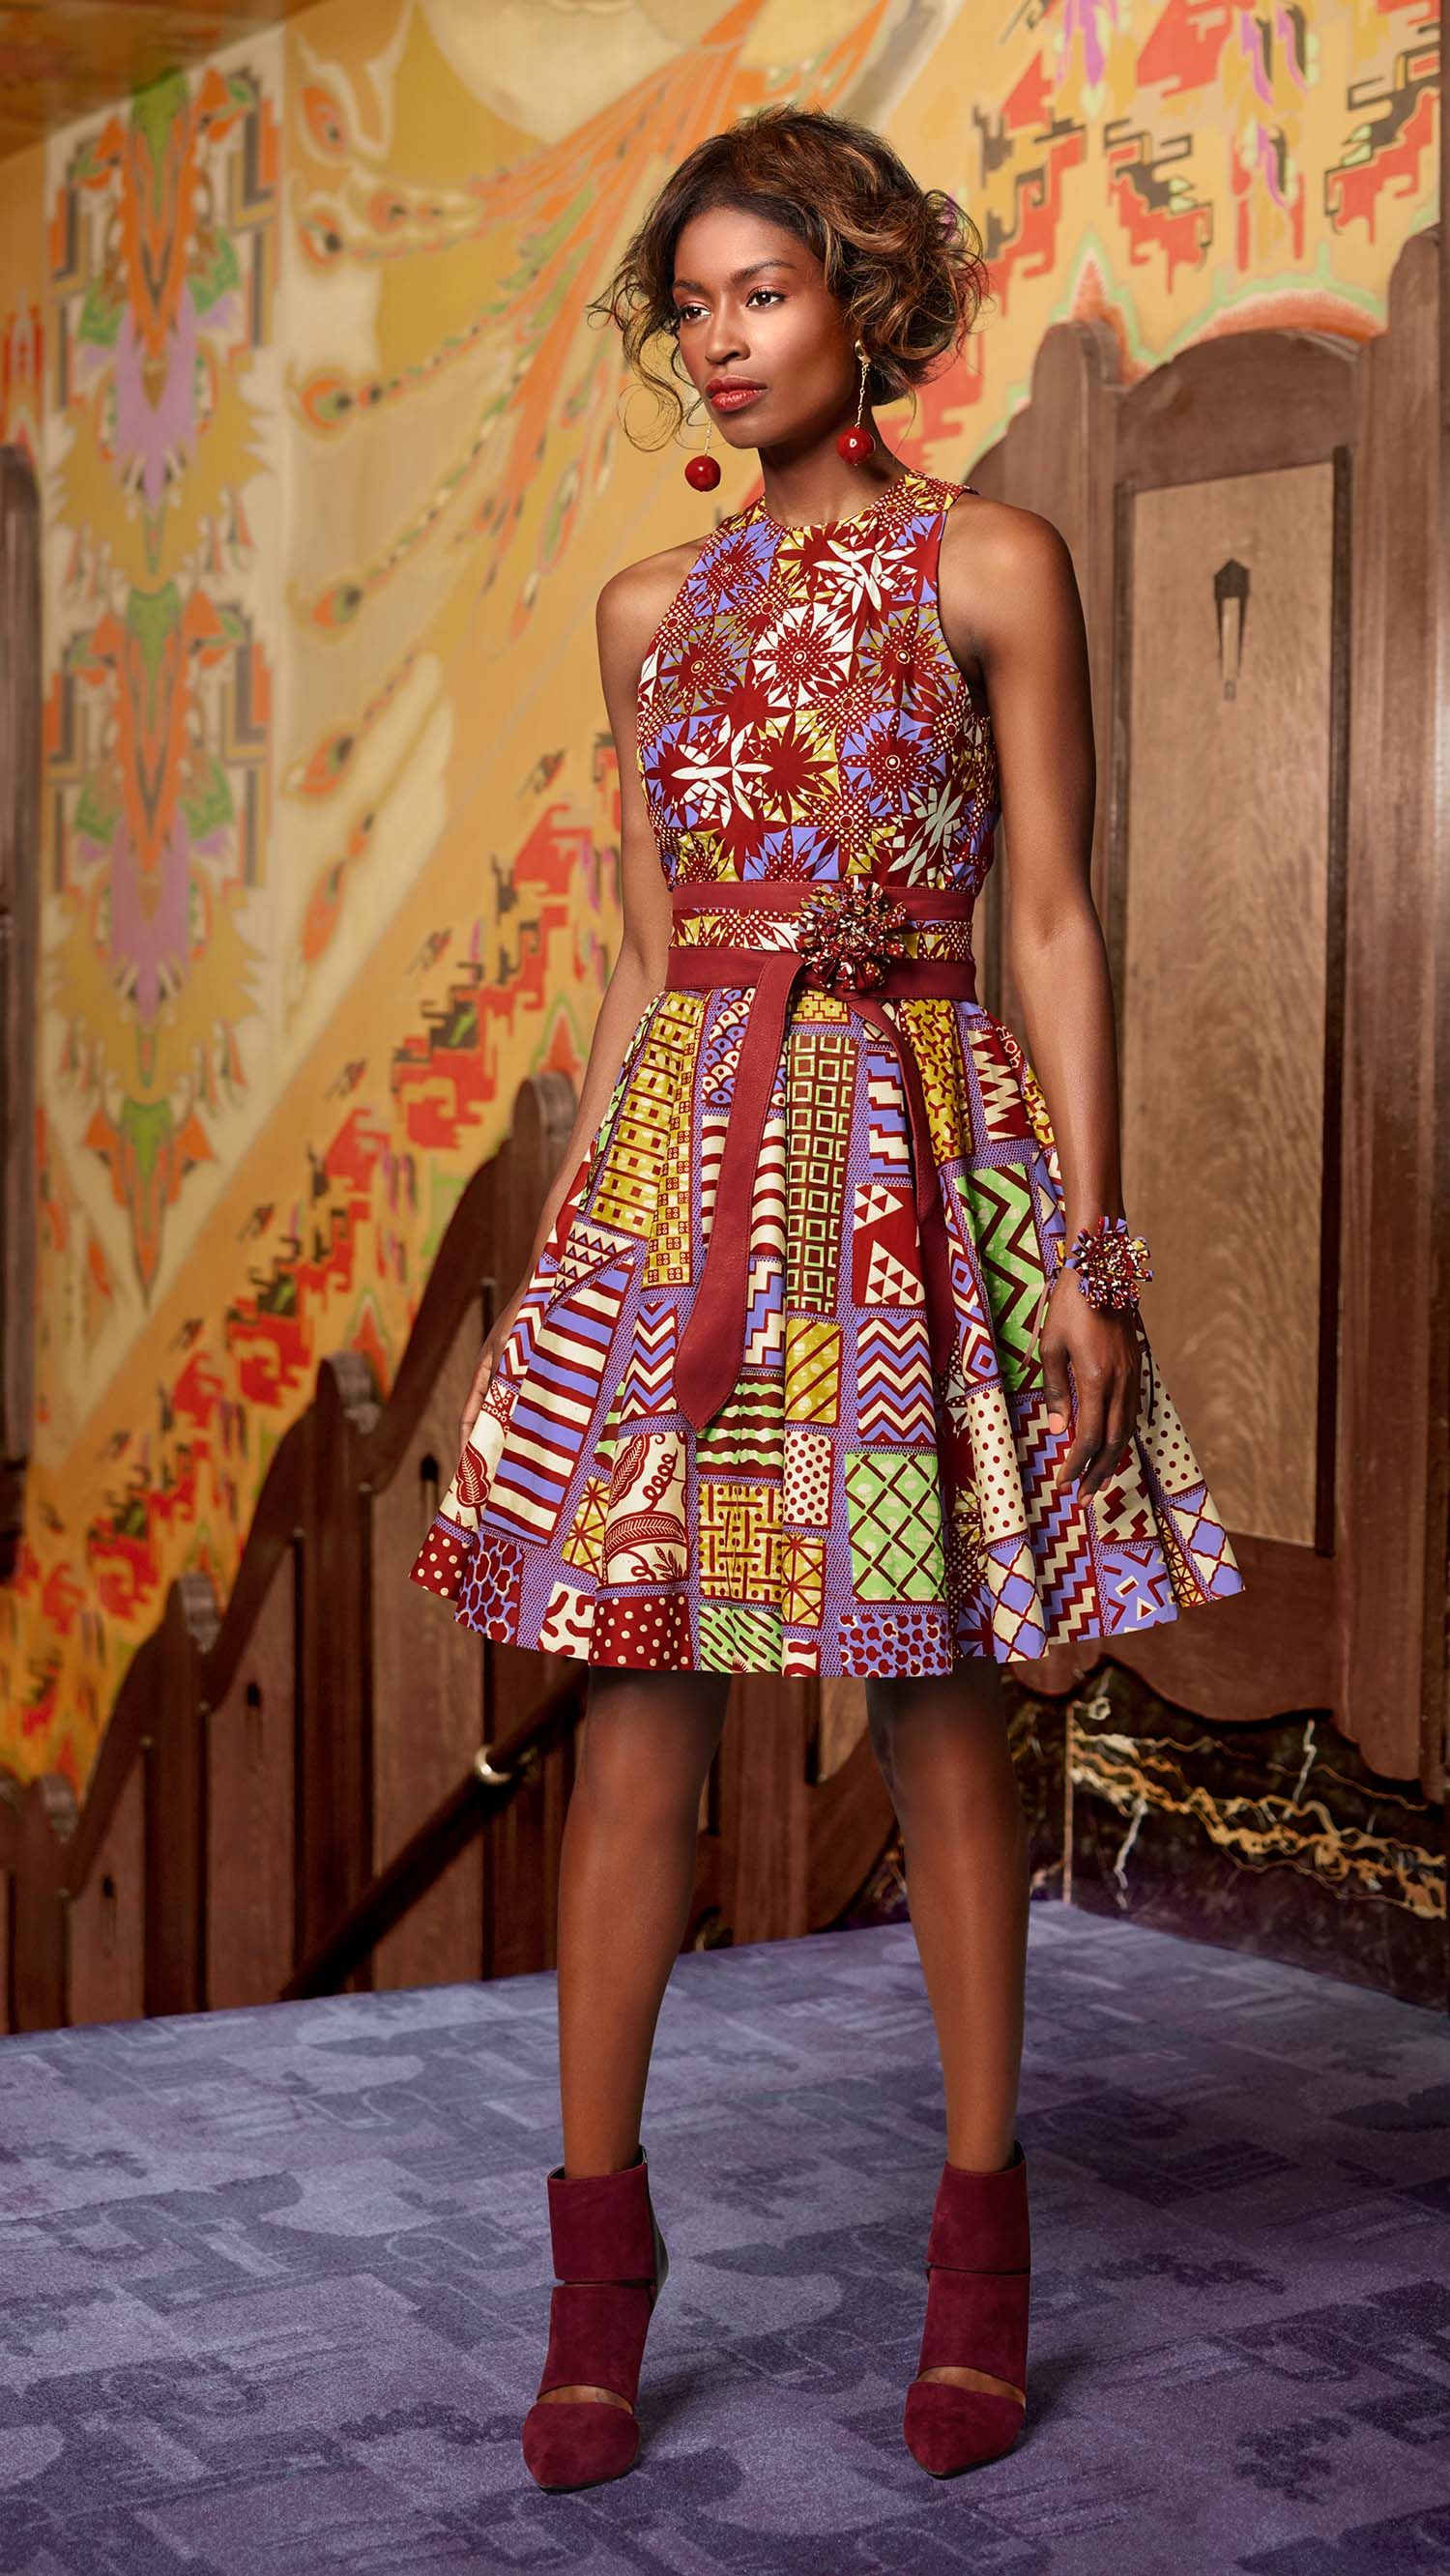 un esprit classique vlisco v inspired mode africaine. Black Bedroom Furniture Sets. Home Design Ideas